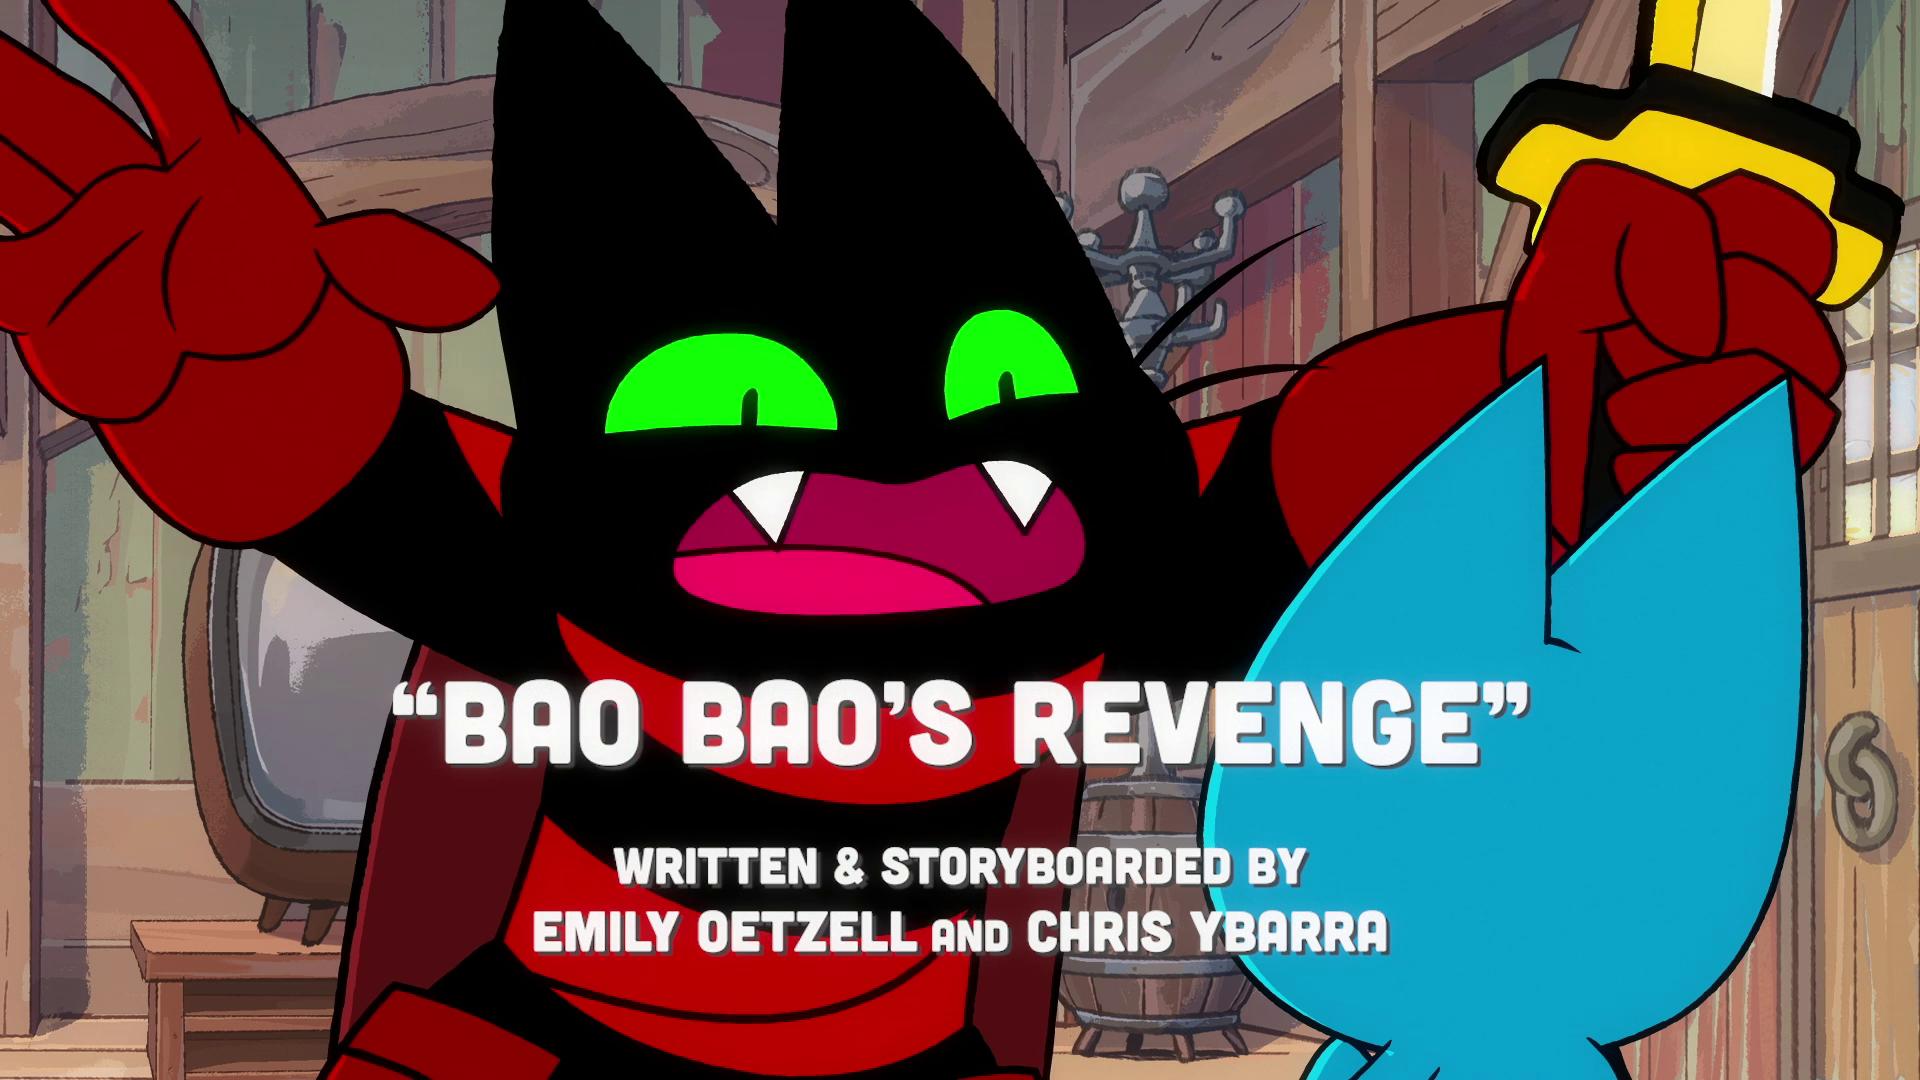 Bao Bao's Revenge/Gallery